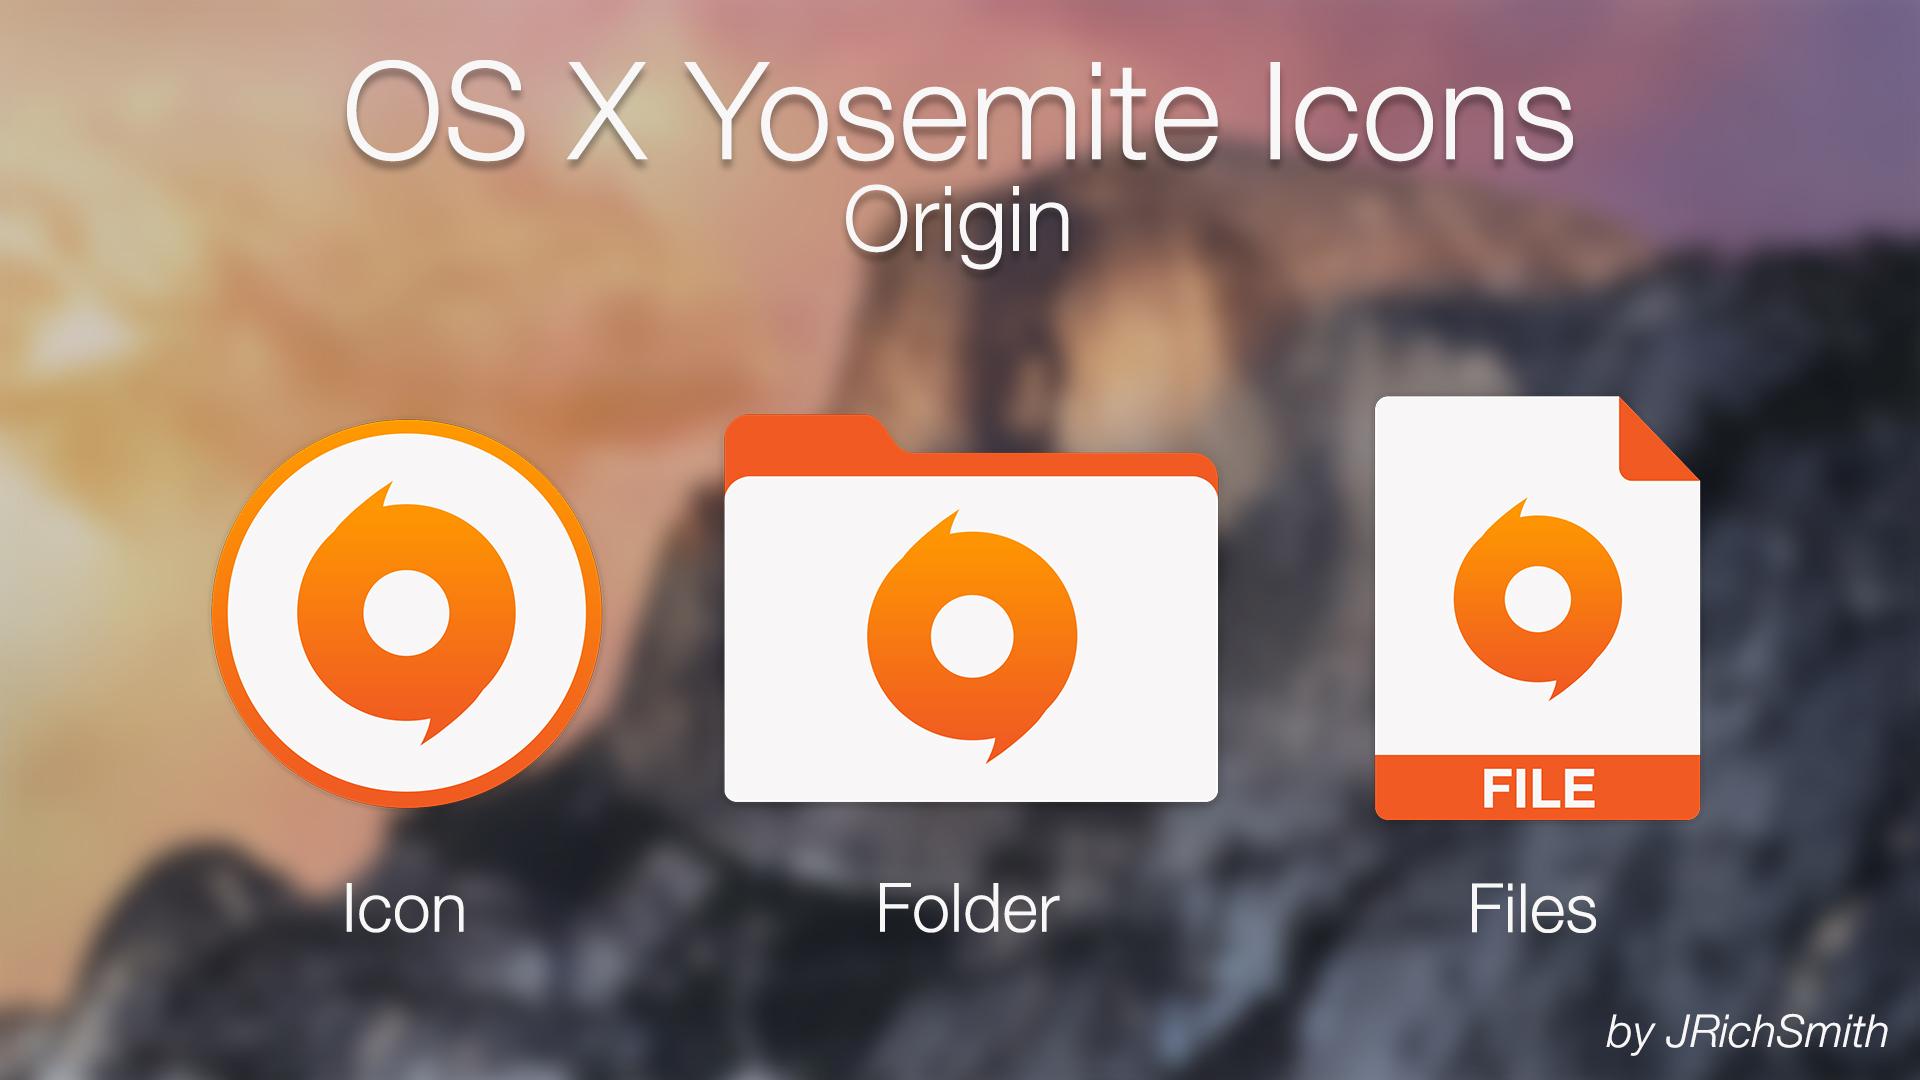 OS X Yosemite - Origin Icons by JRichSmith on DeviantArt